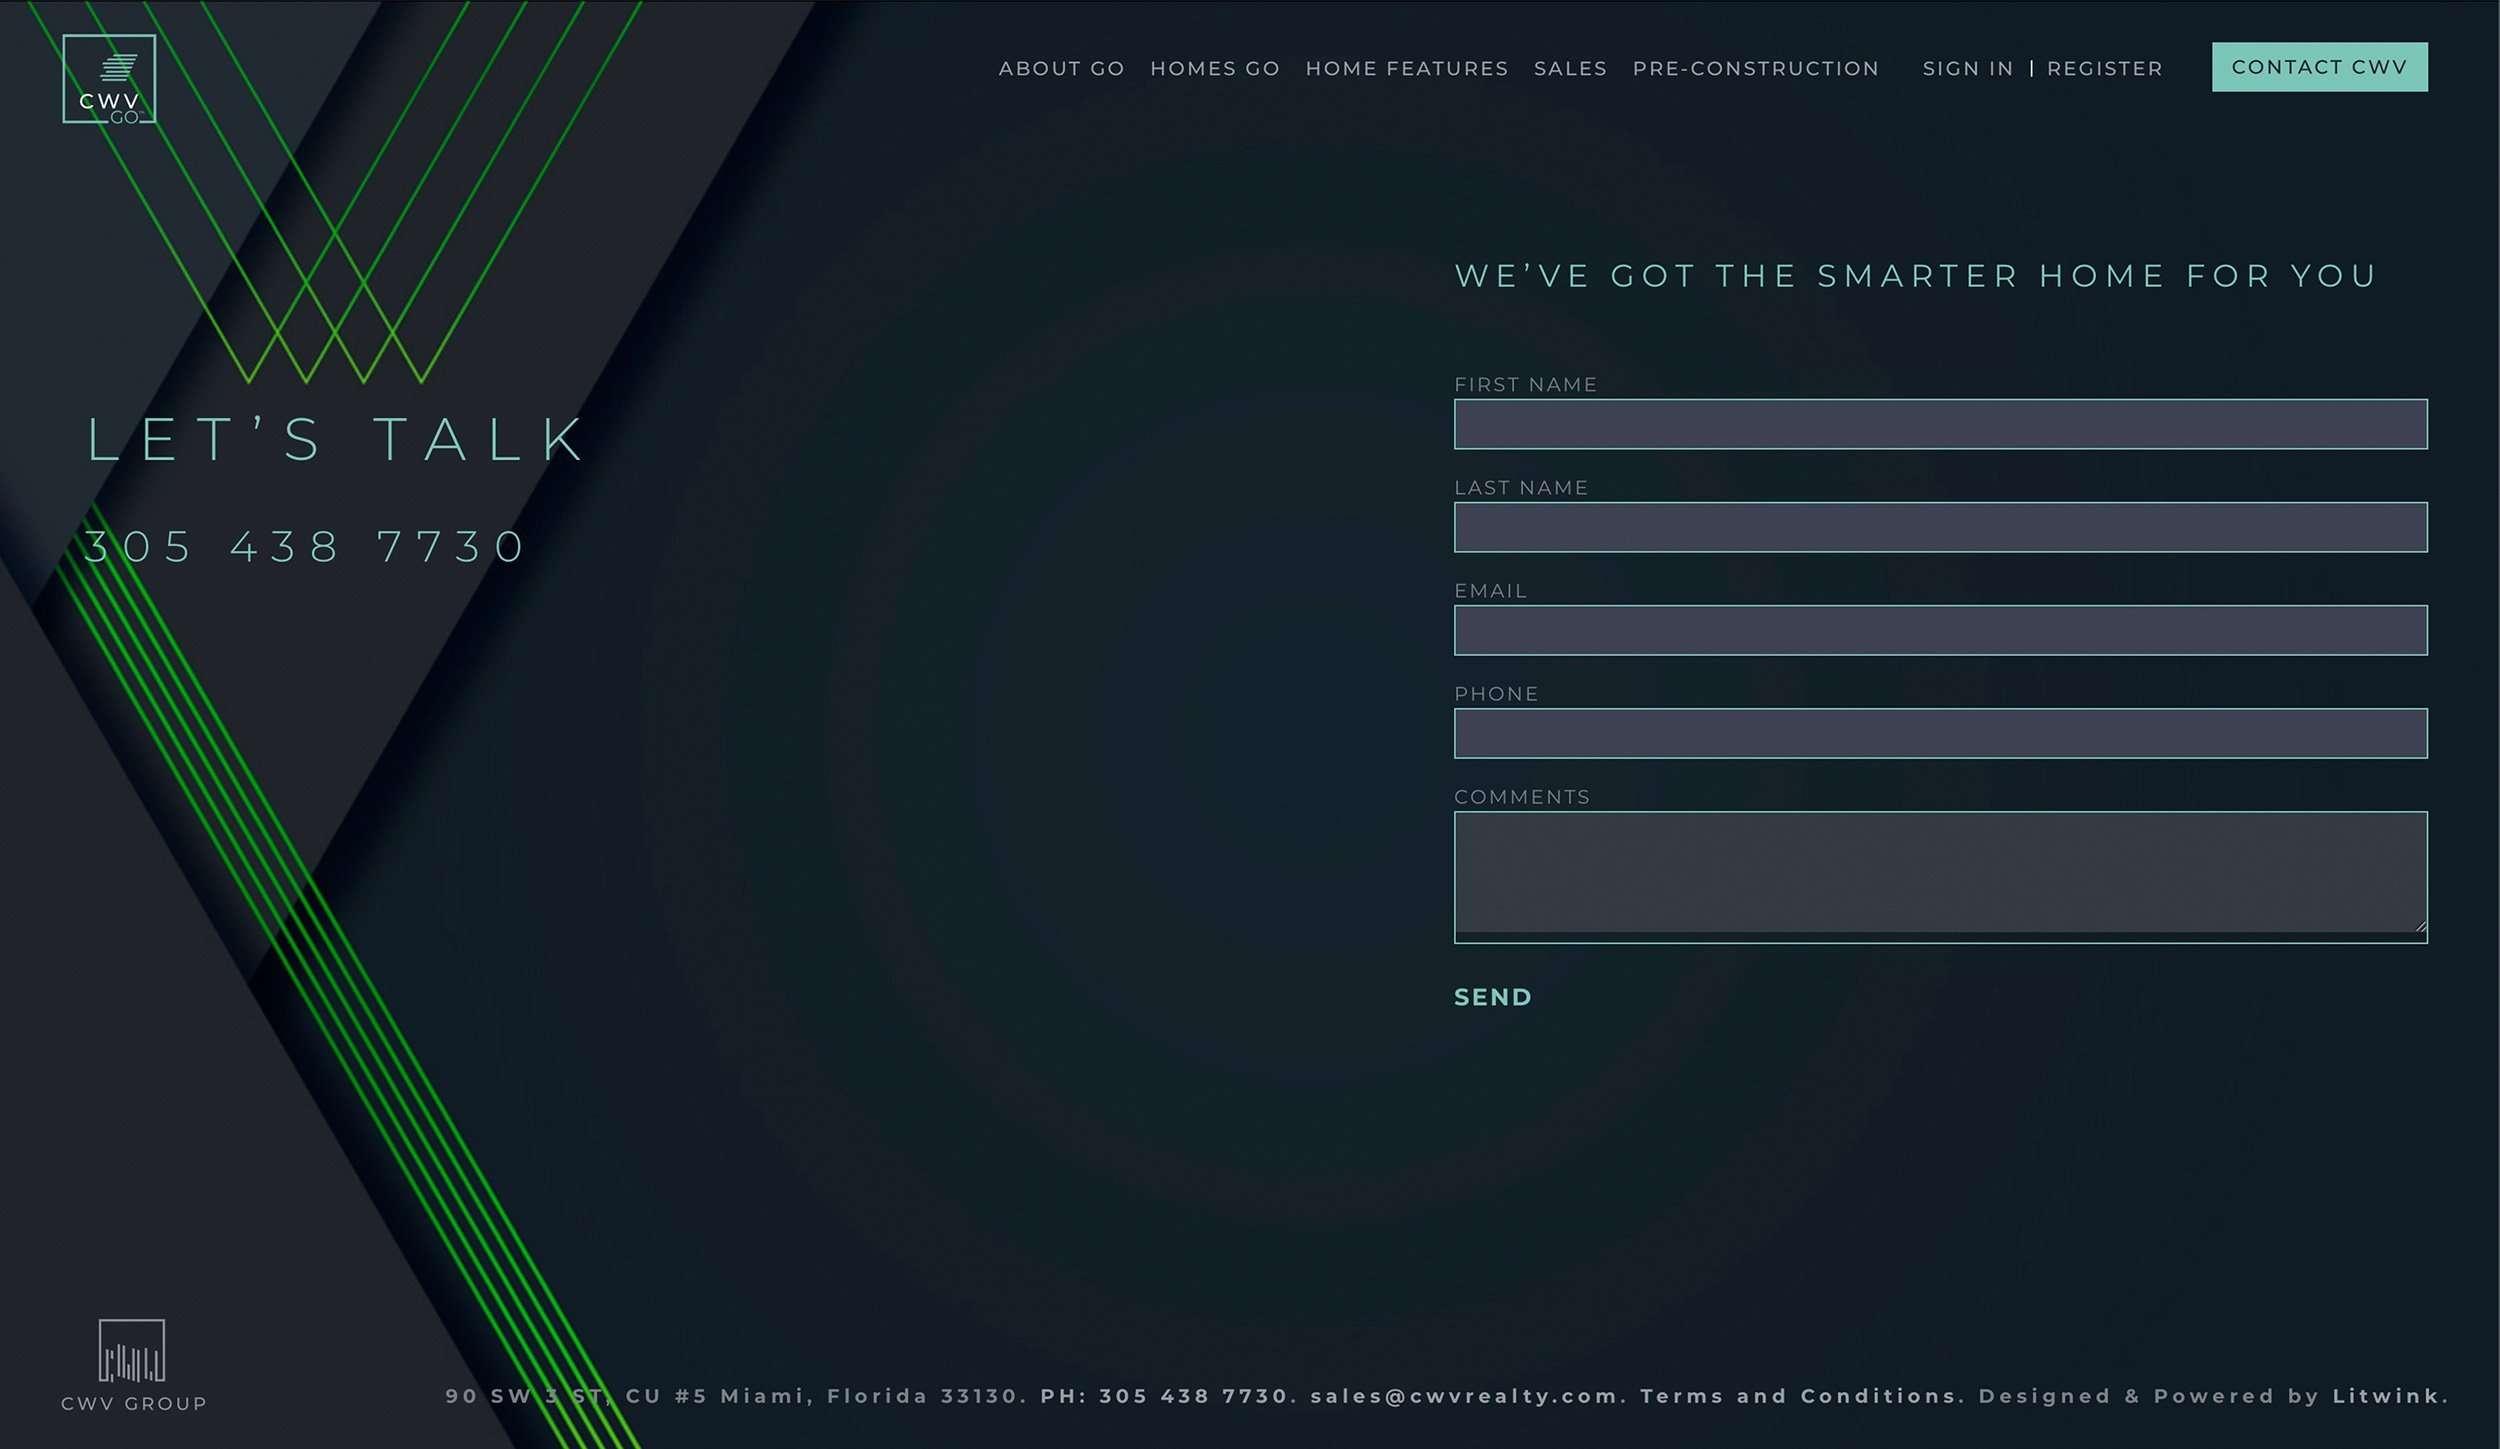 cwv-group-miami-usa-estados-unidos-real-estate-online-lab-lisbon-web-development-web-design-13